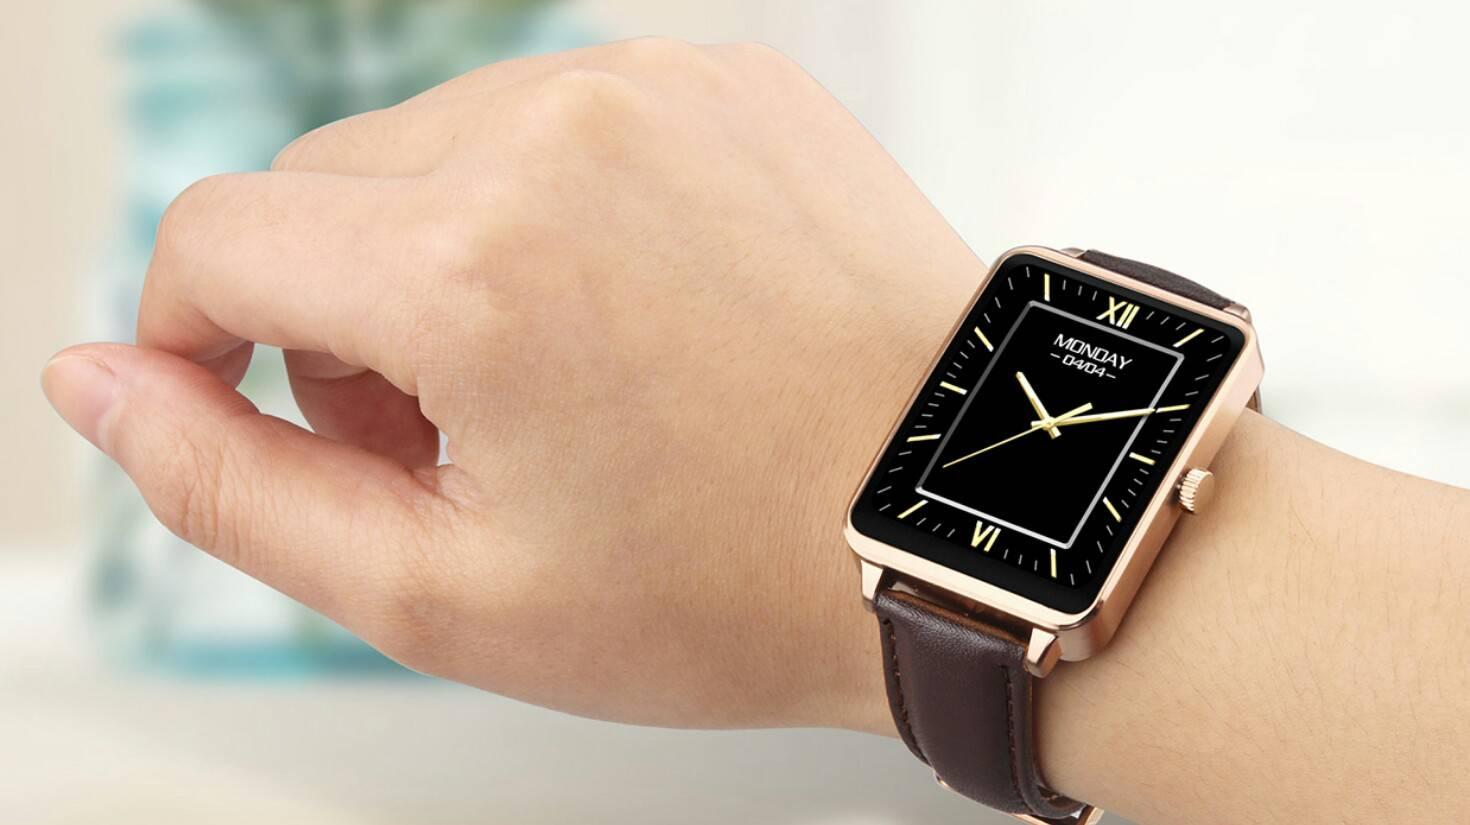 Oukitel A58 smartwatch 2